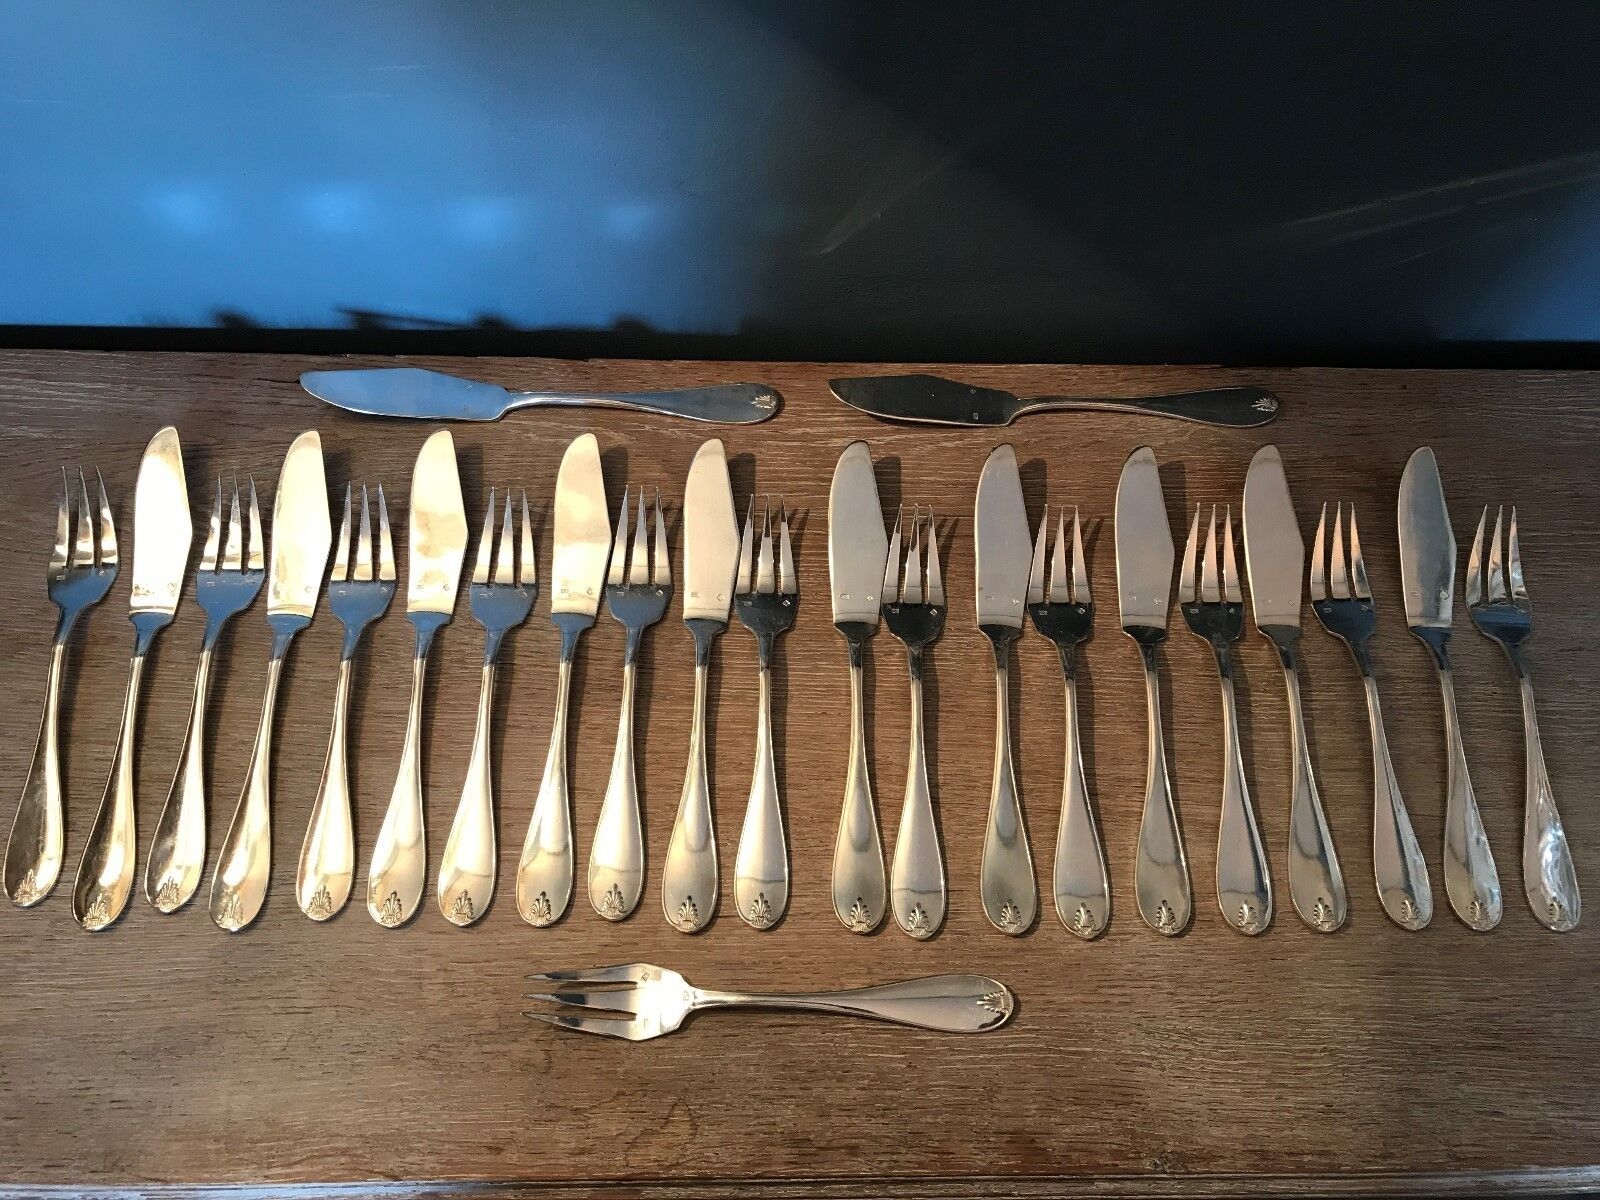 12 couGrüns à poisson,métal Silberé,Empire,XX°.